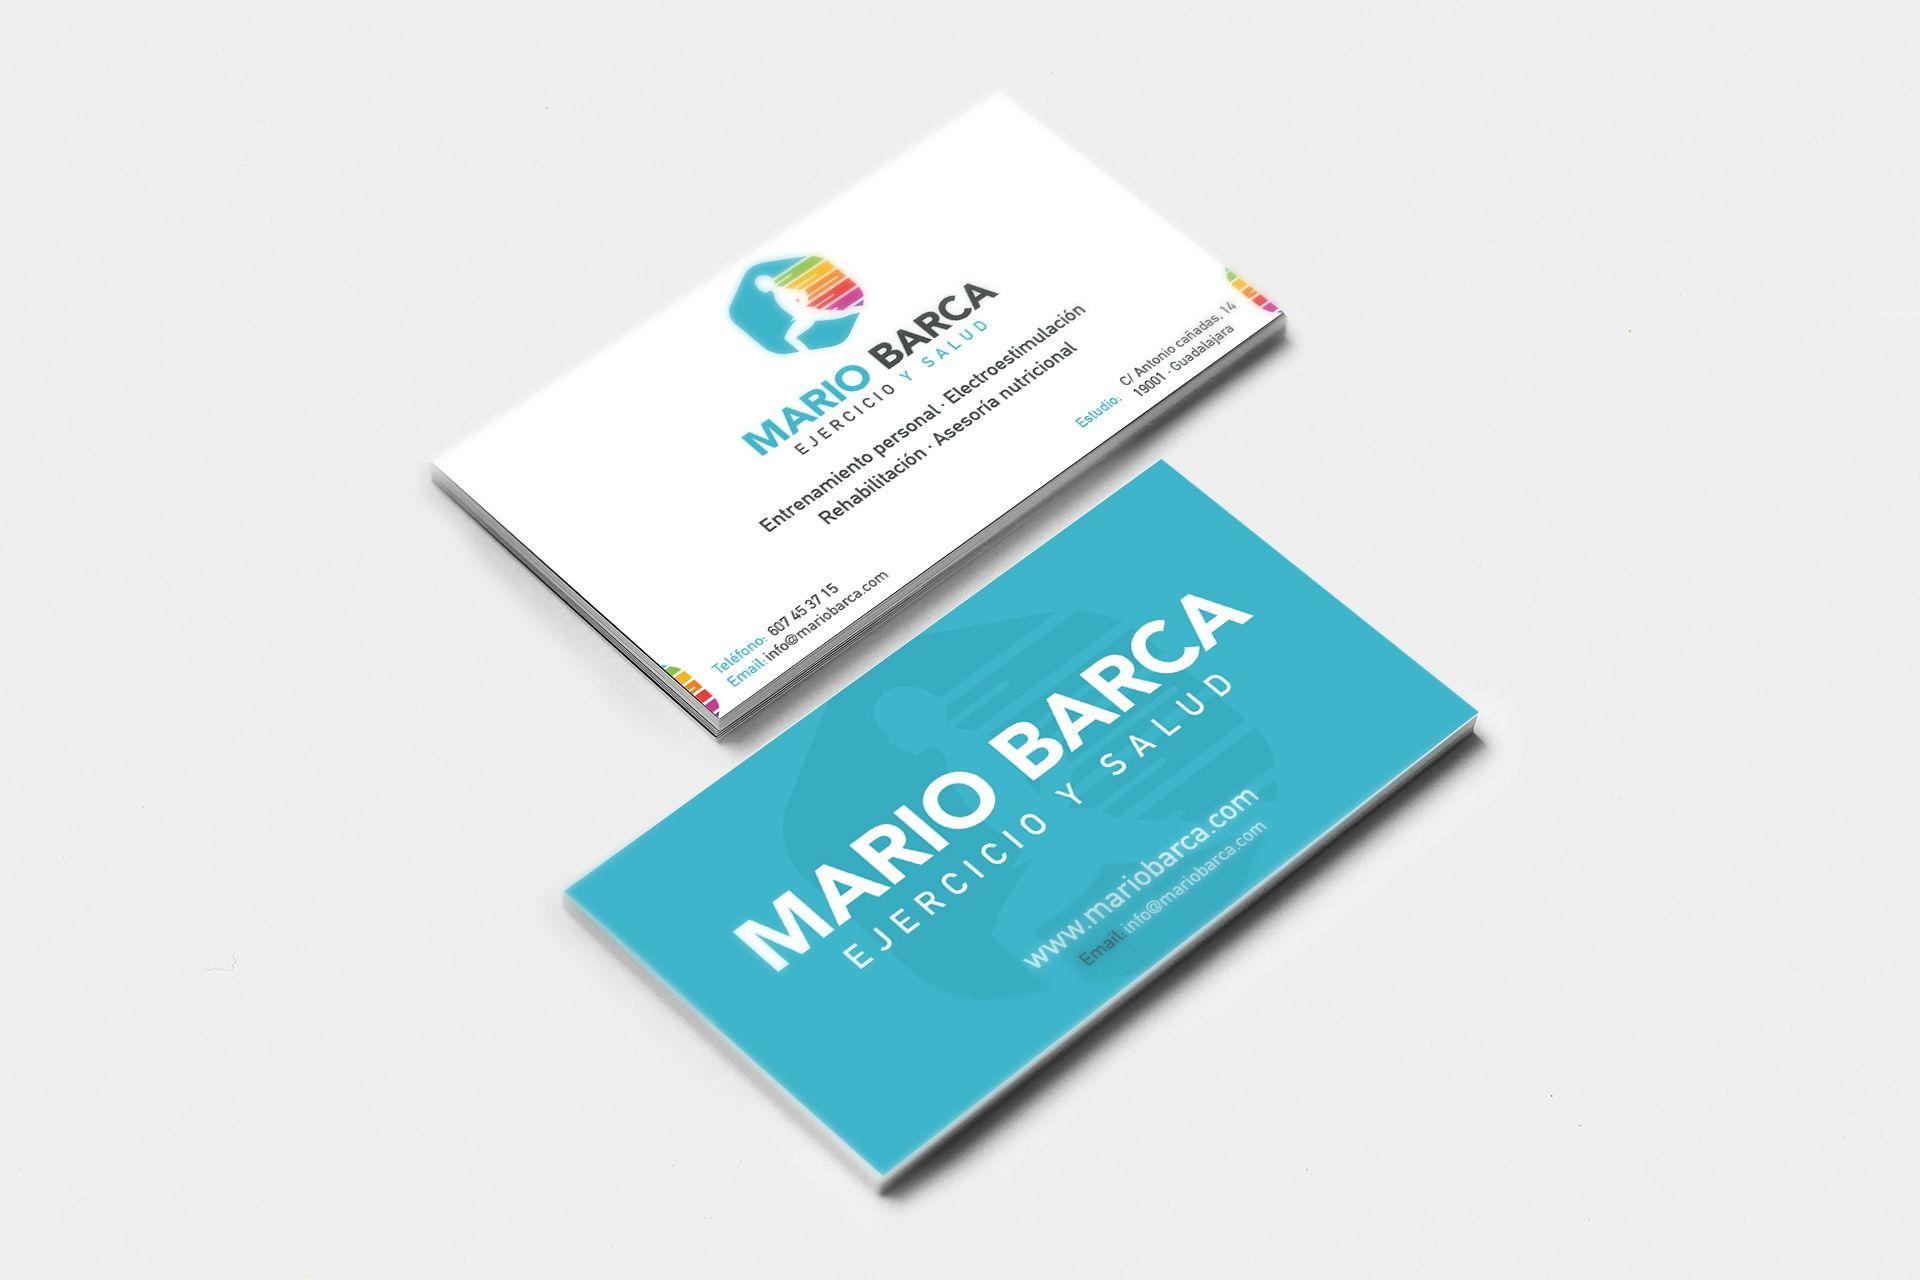 Logotipo Mario Barca